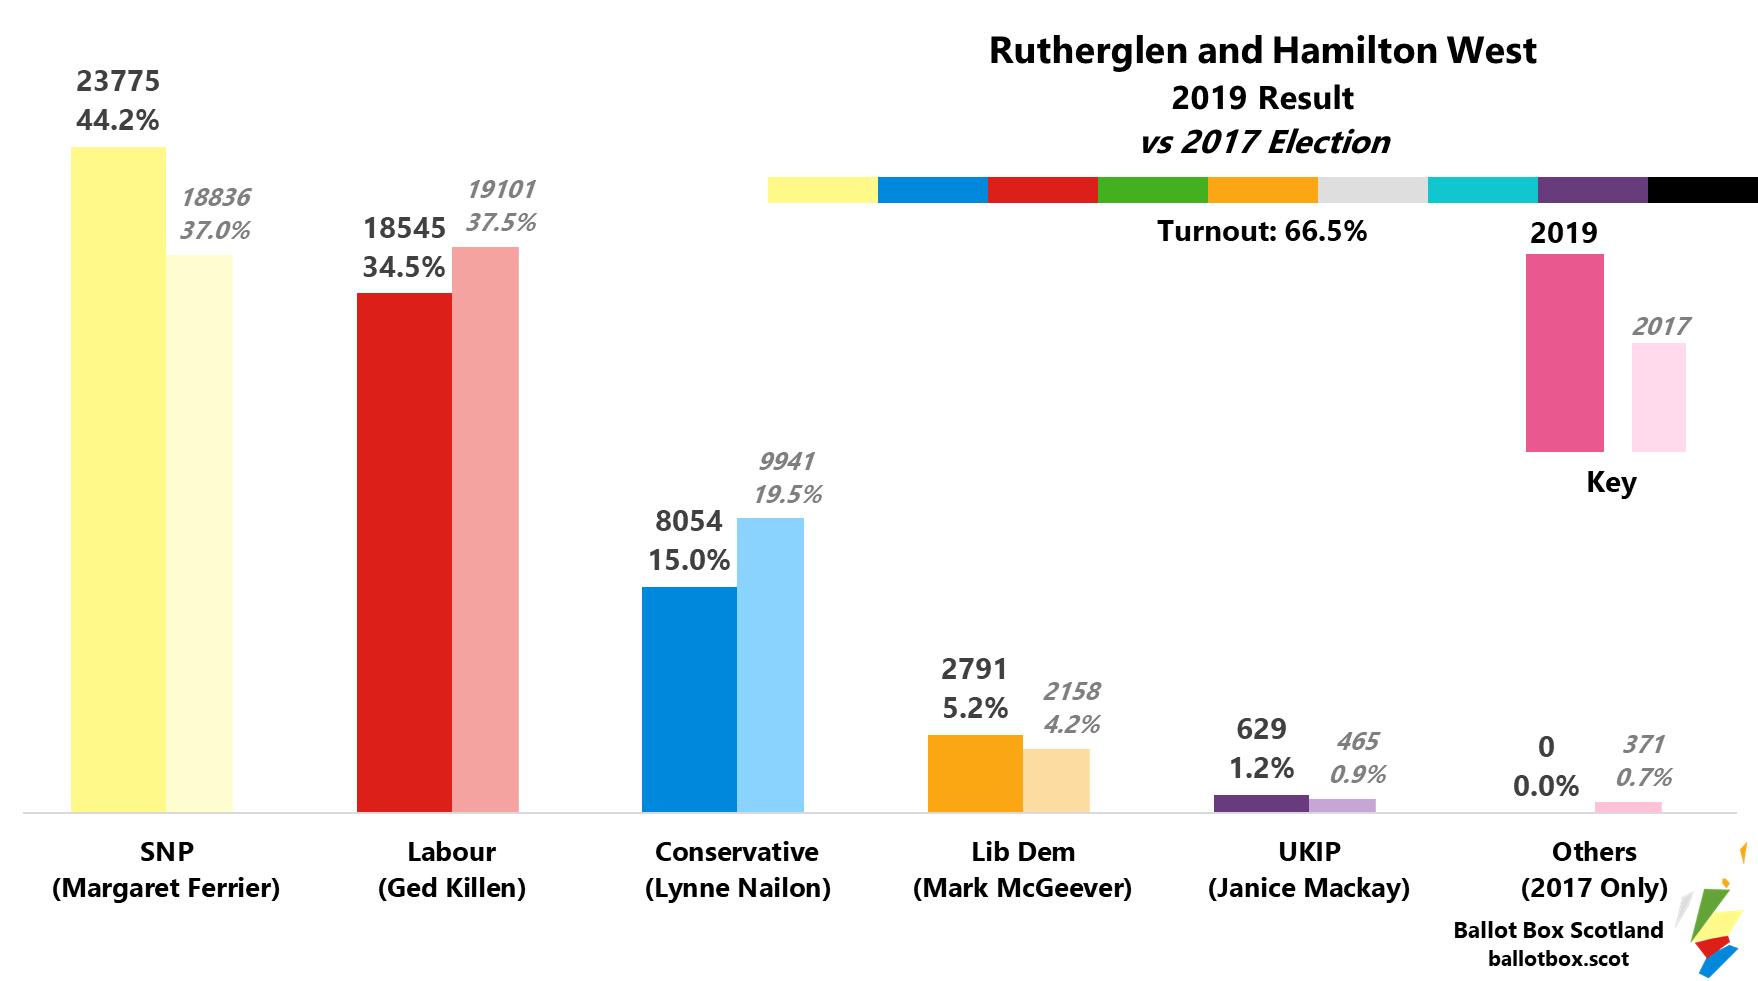 Rutherglen and Hamilton West 2019